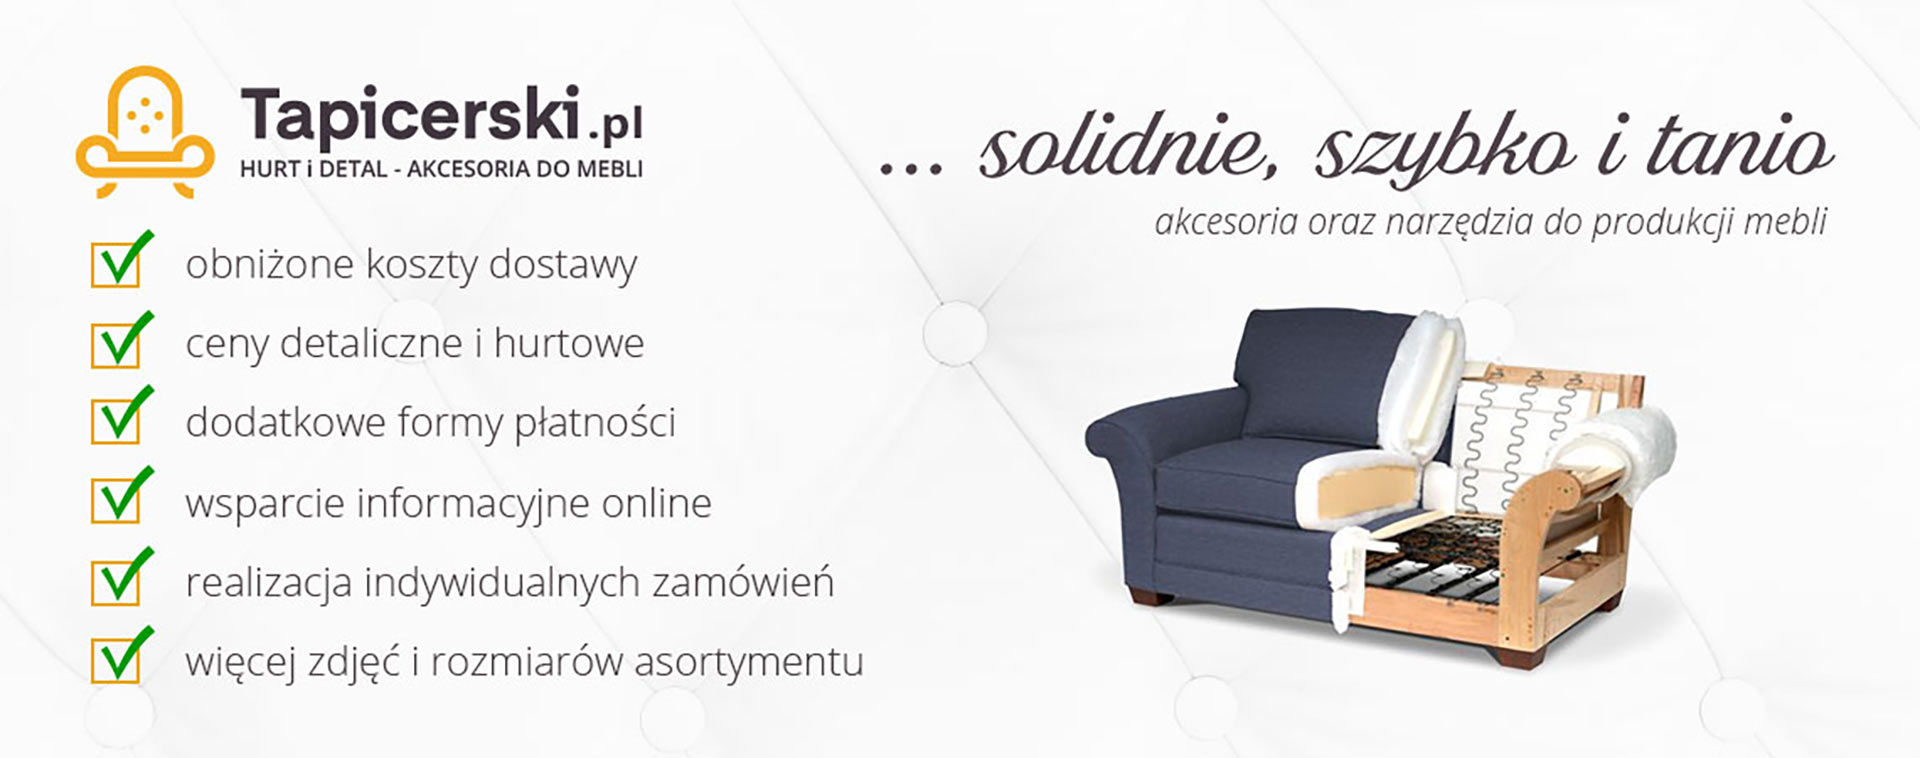 Oferta Tapicerski.pl